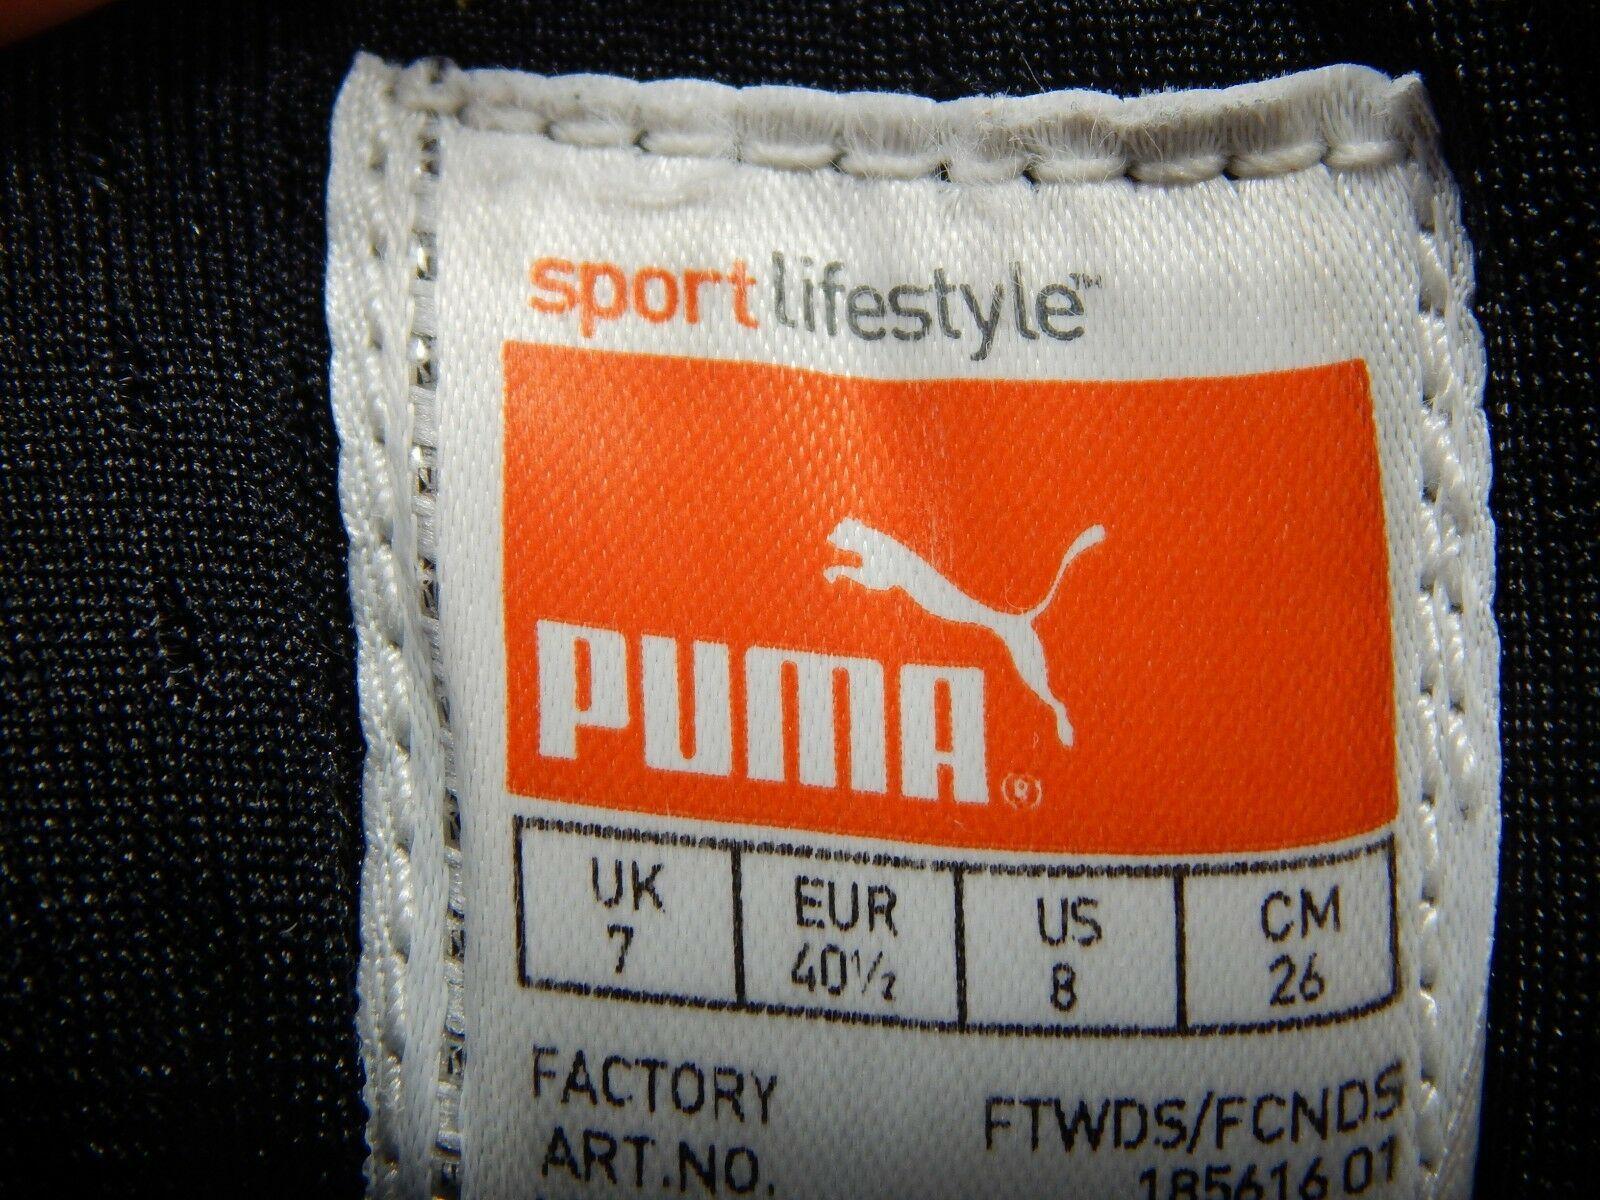 Puma Handy 185616 01 Größe Us 8 M (D) Eu 40.5 Herren Laufschuhe Weiß Schwarz